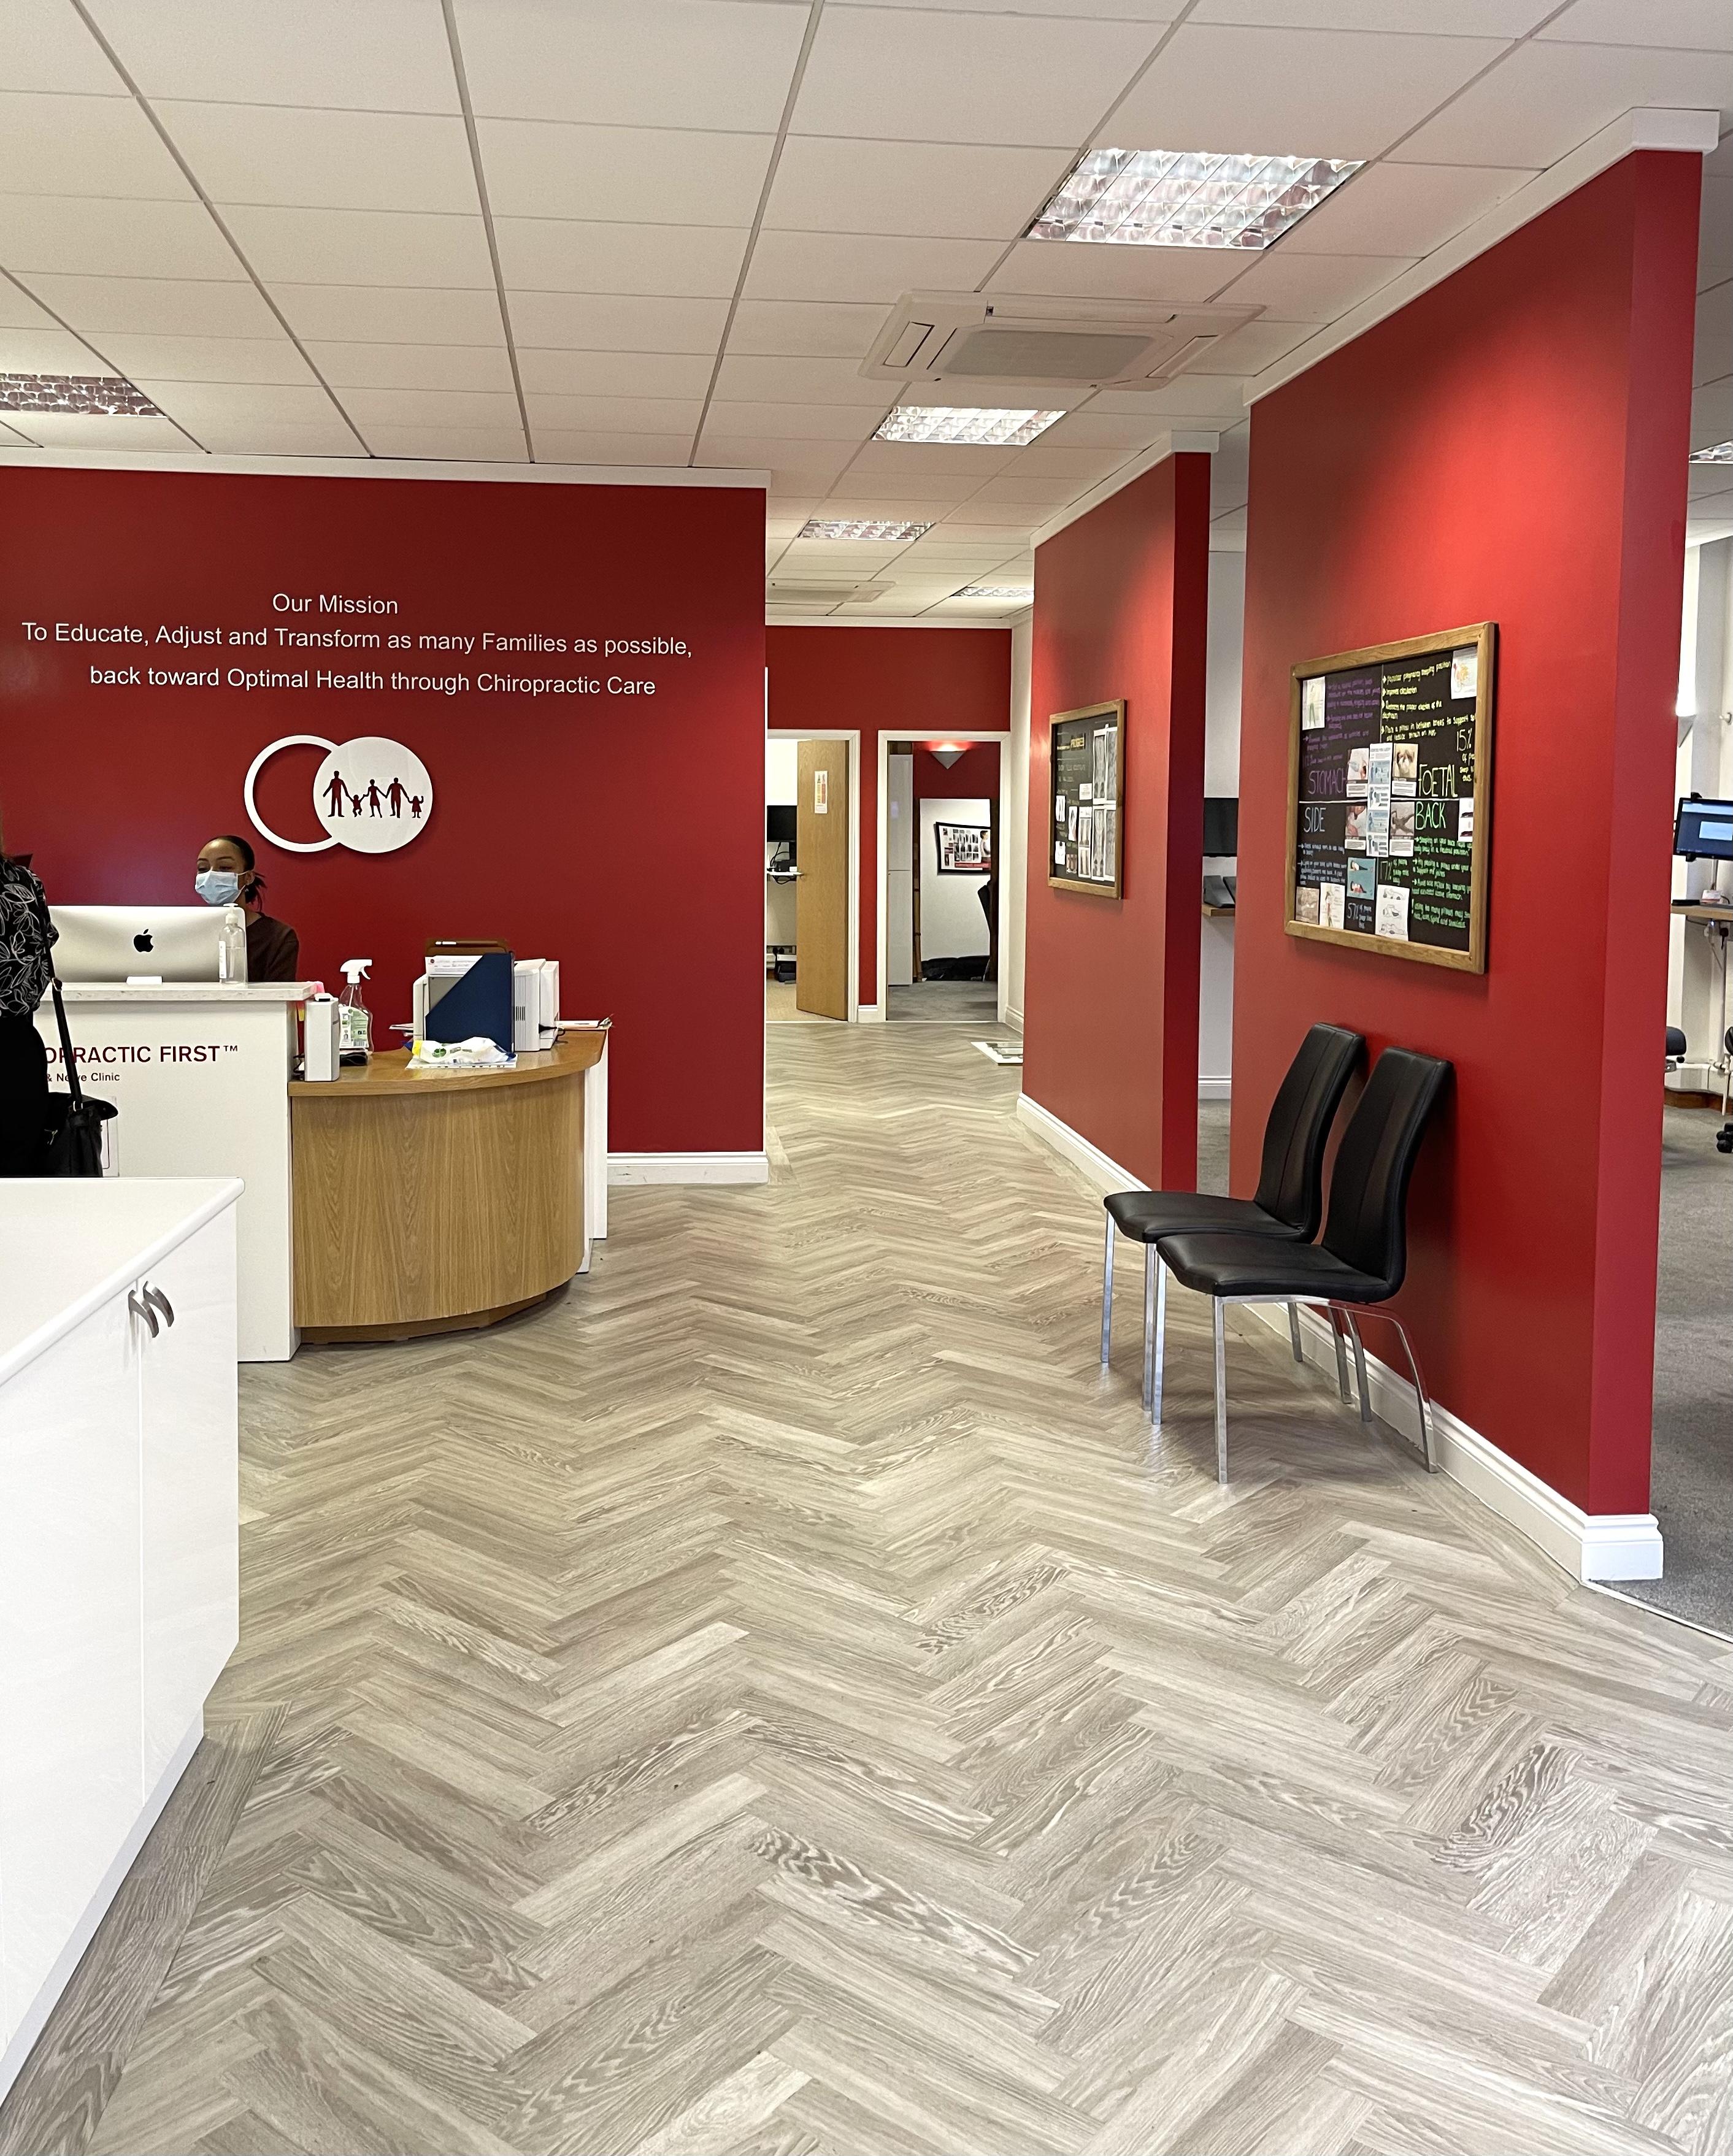 Leeds City Centre's clinic